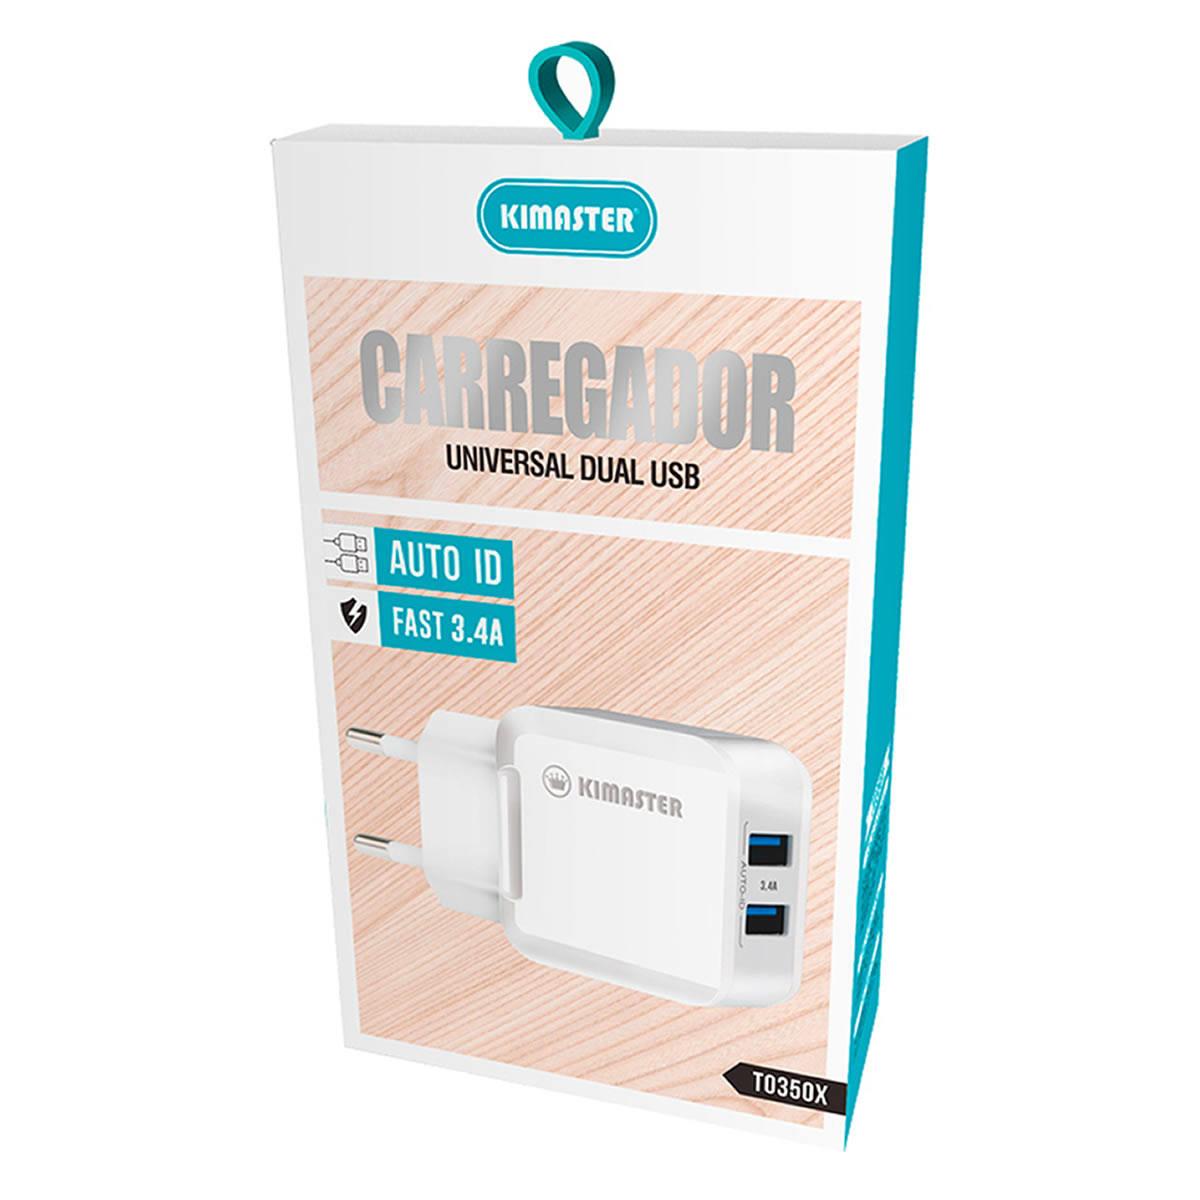 Carregador Universal Dual USB Fast 3.4A Auto ID Kimaster TO350X